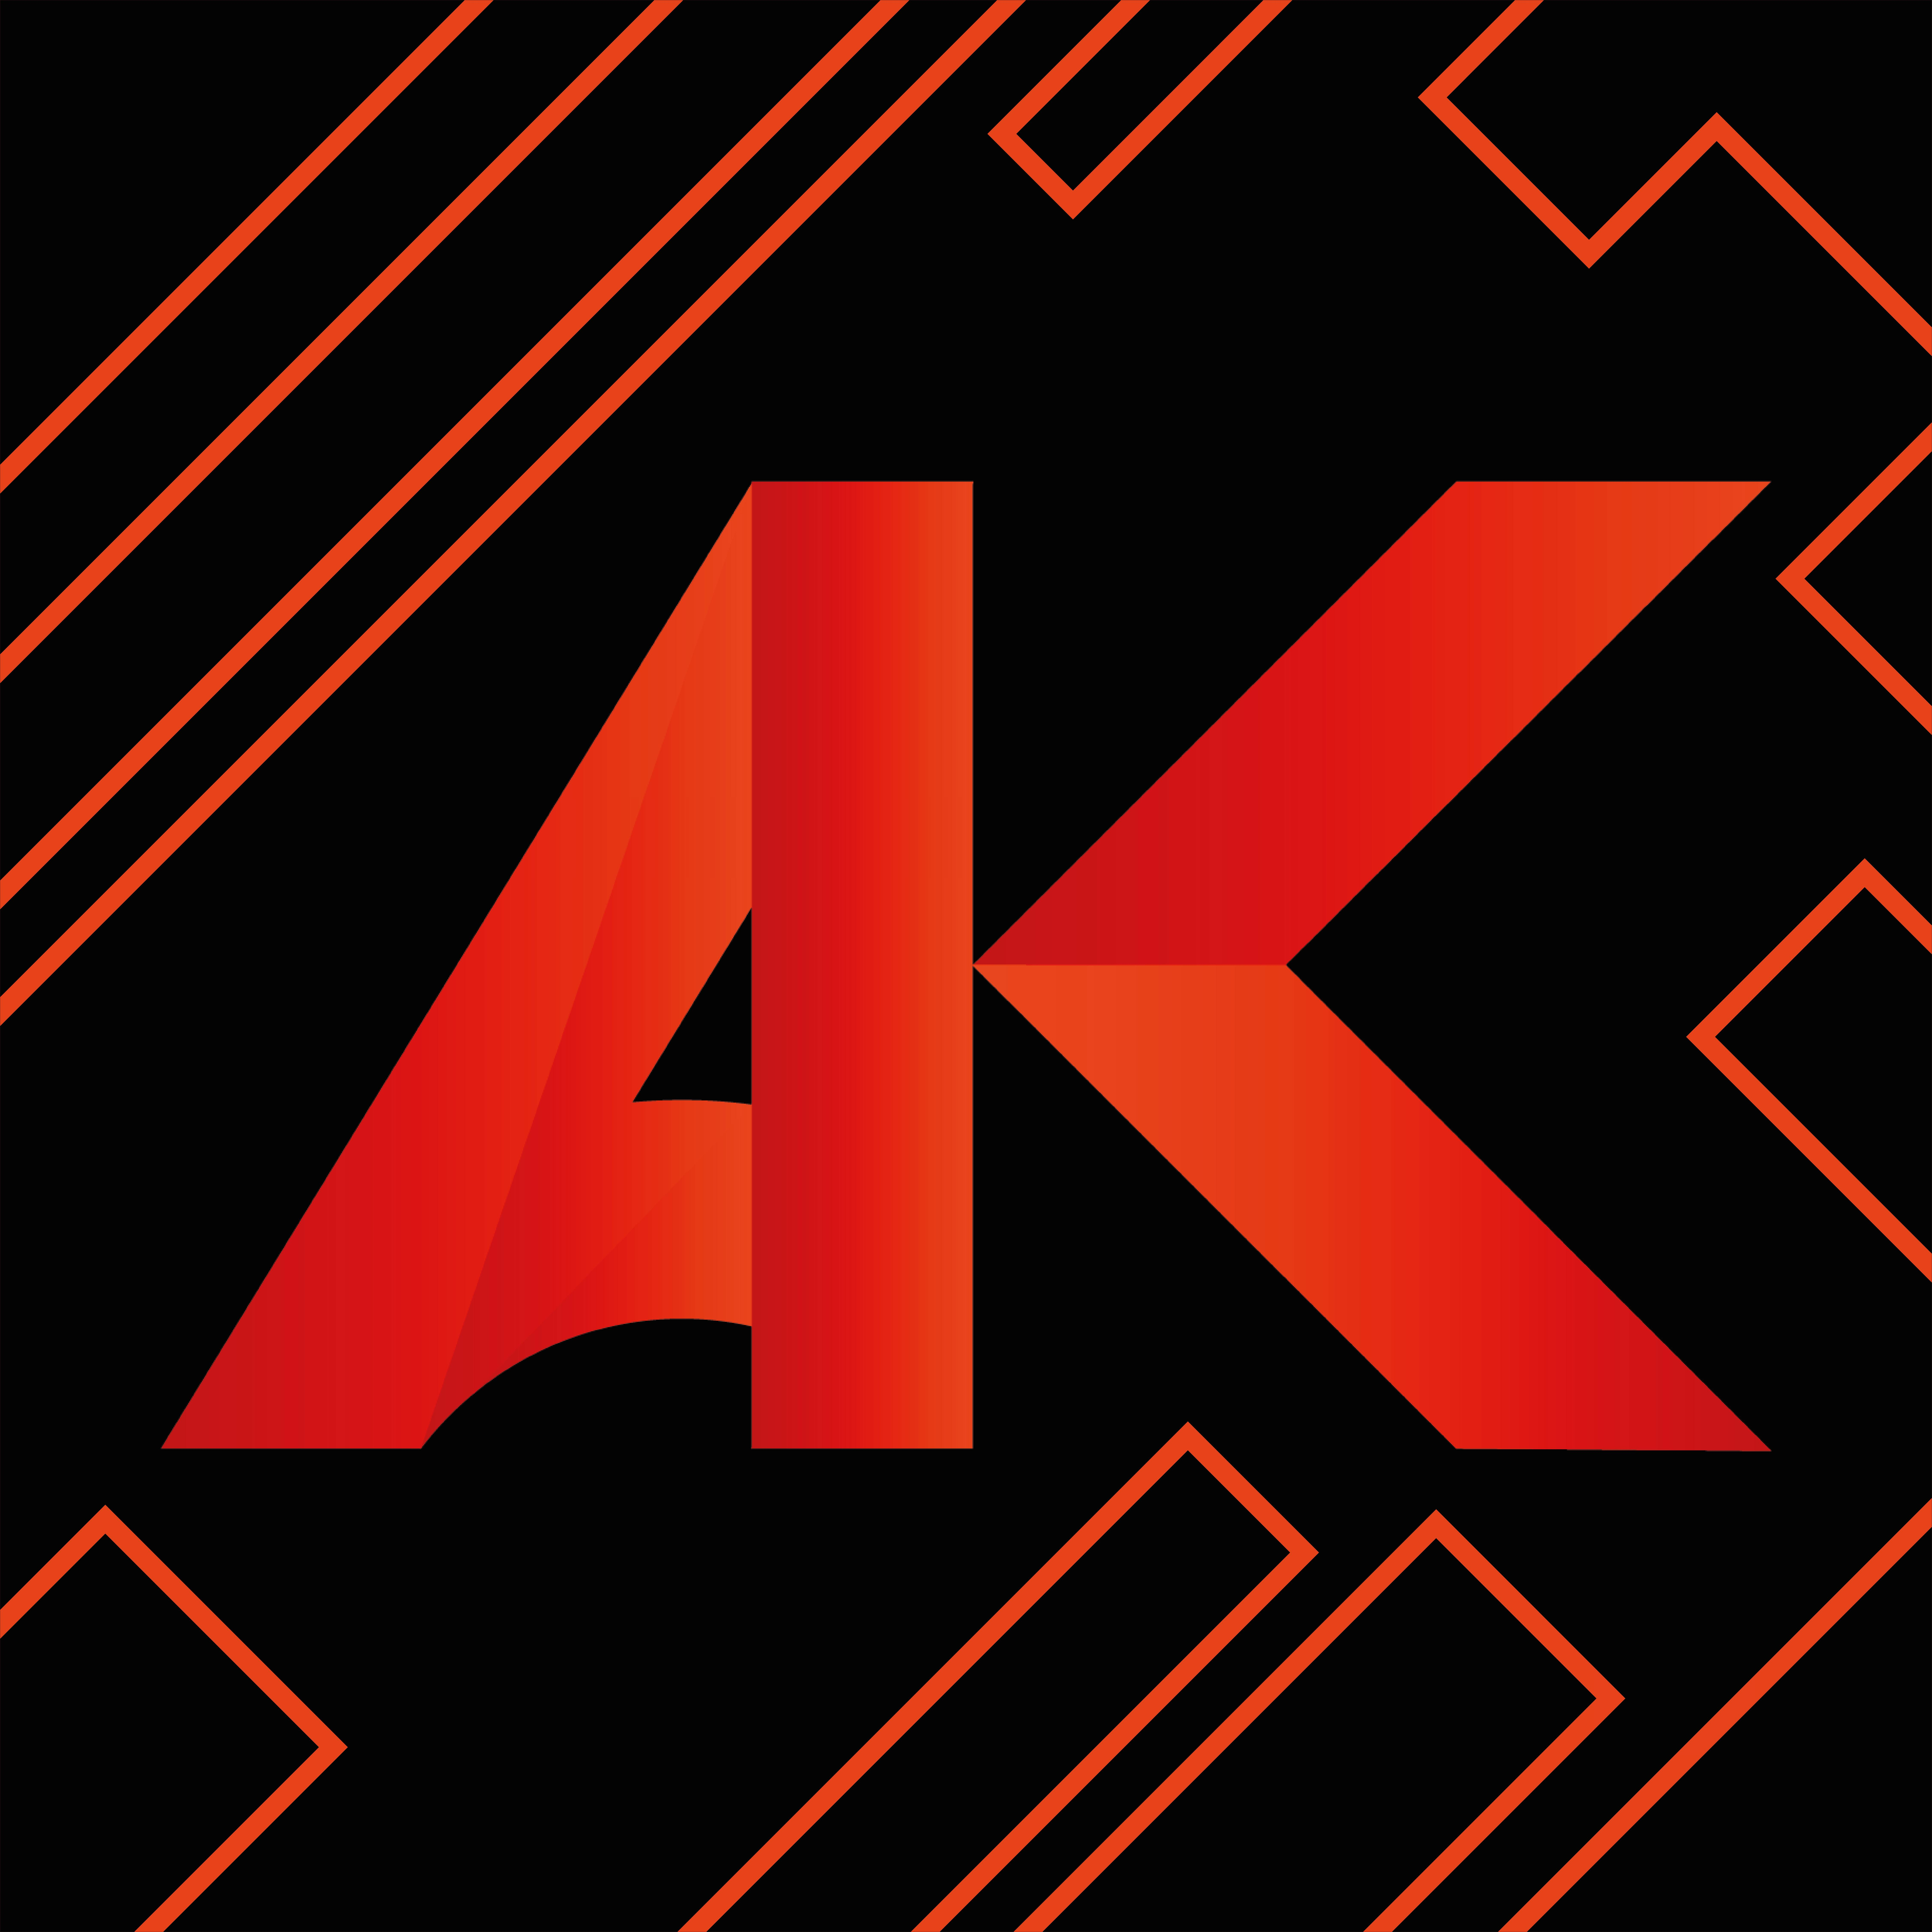 AlKo_Design